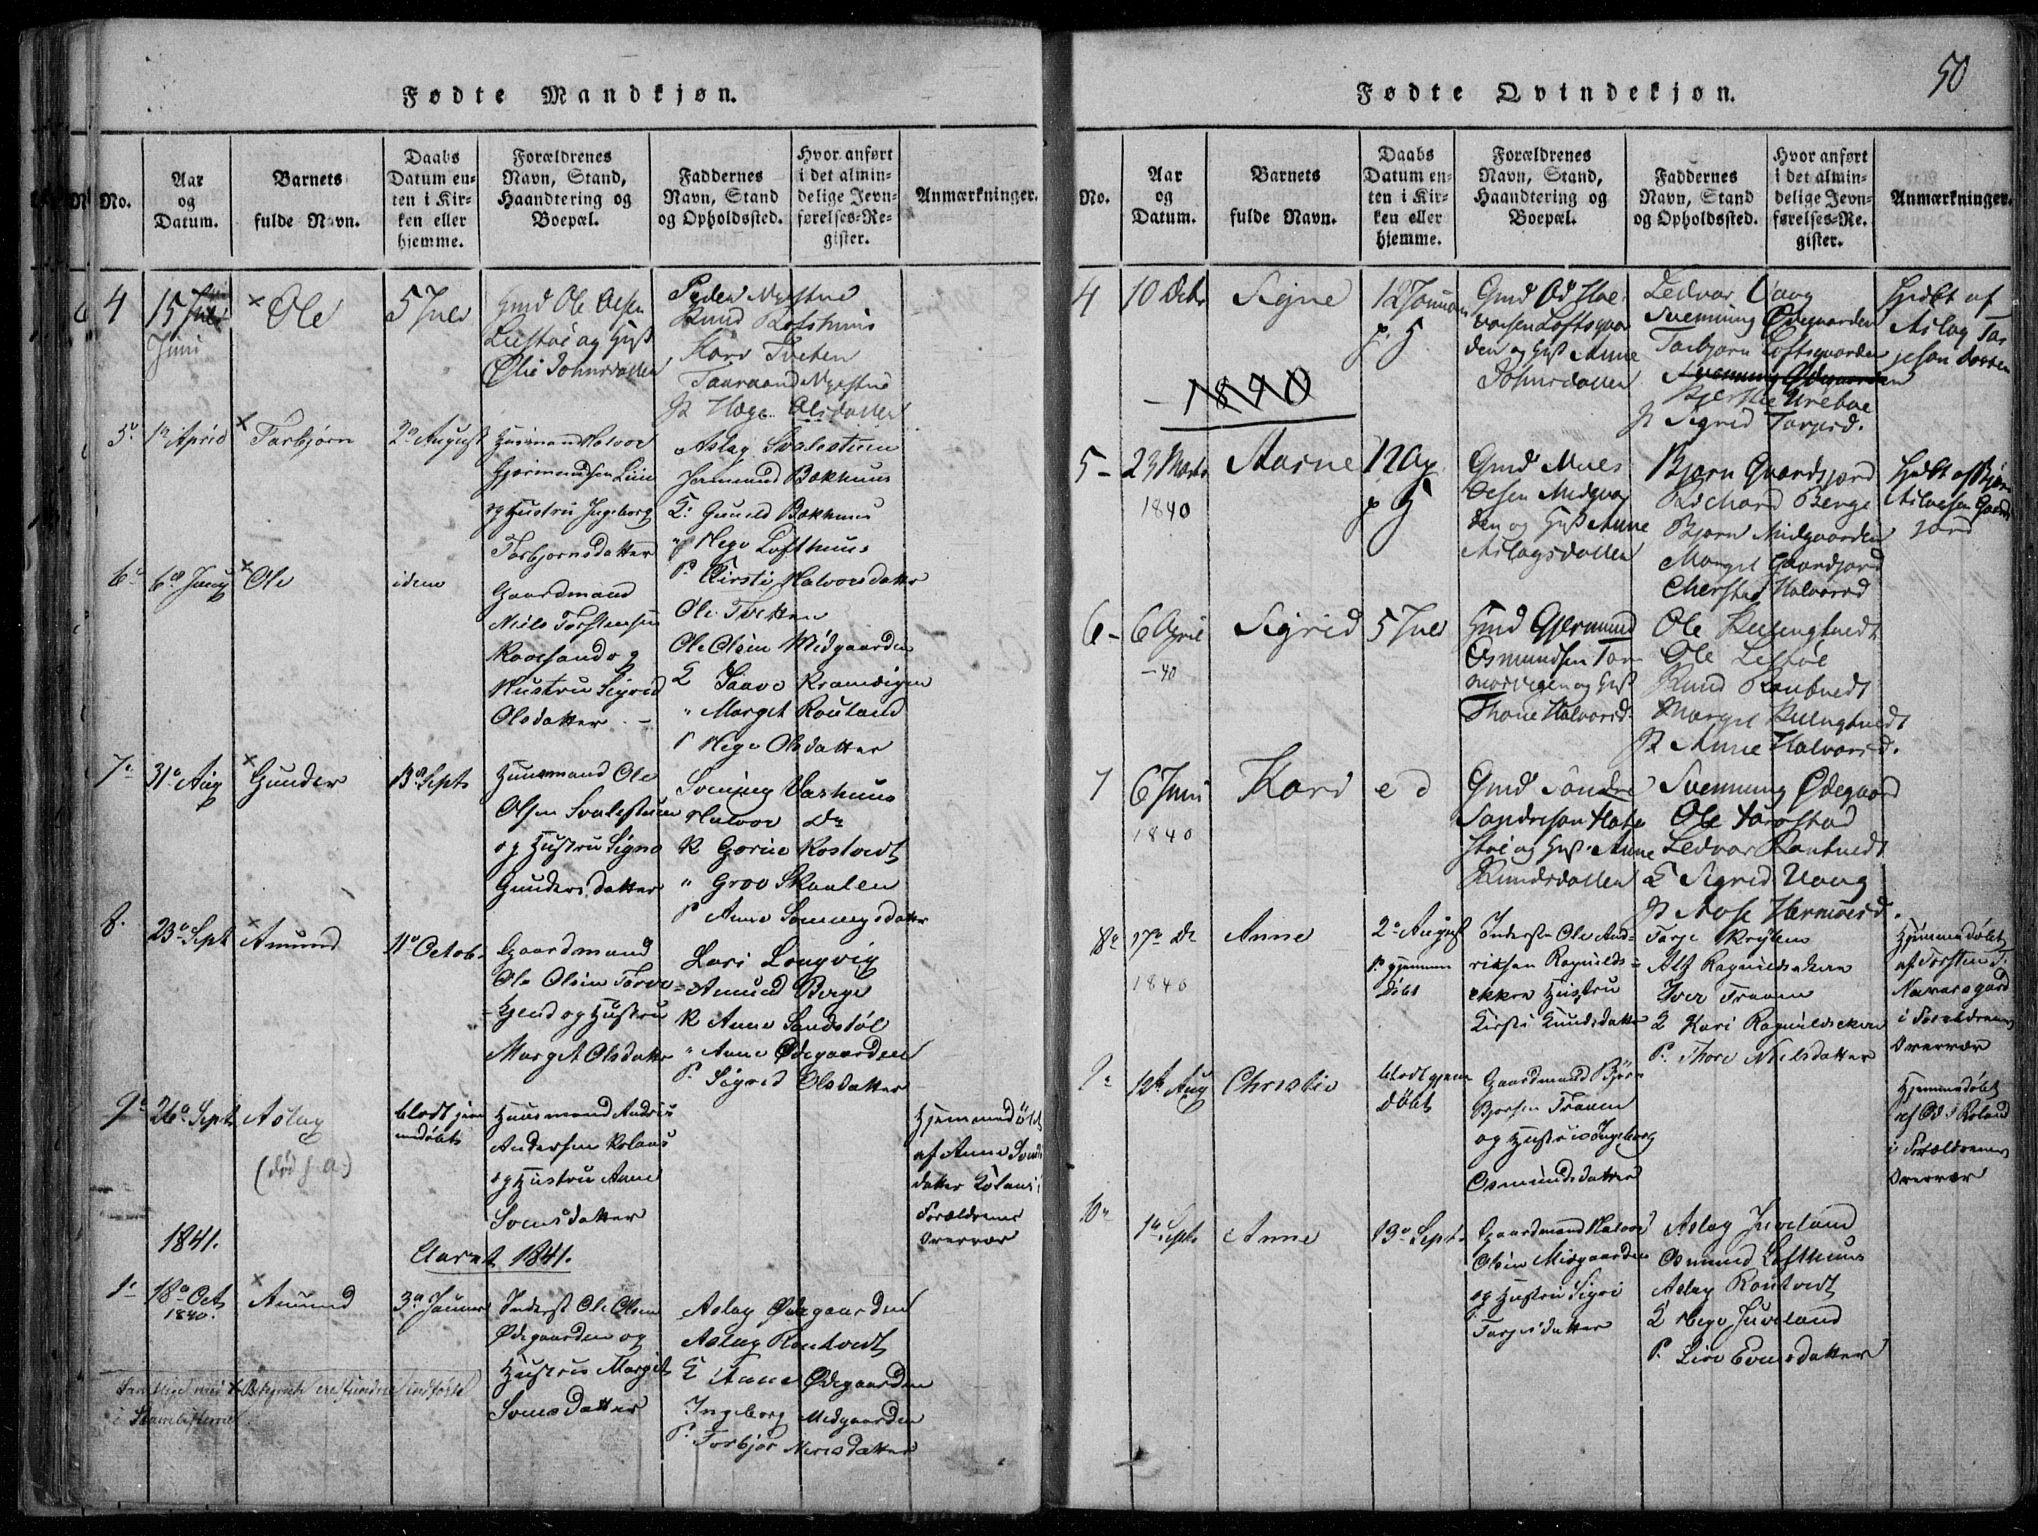 SAKO, Rauland kirkebøker, F/Fa/L0001: Ministerialbok nr. 1, 1814-1859, s. 50